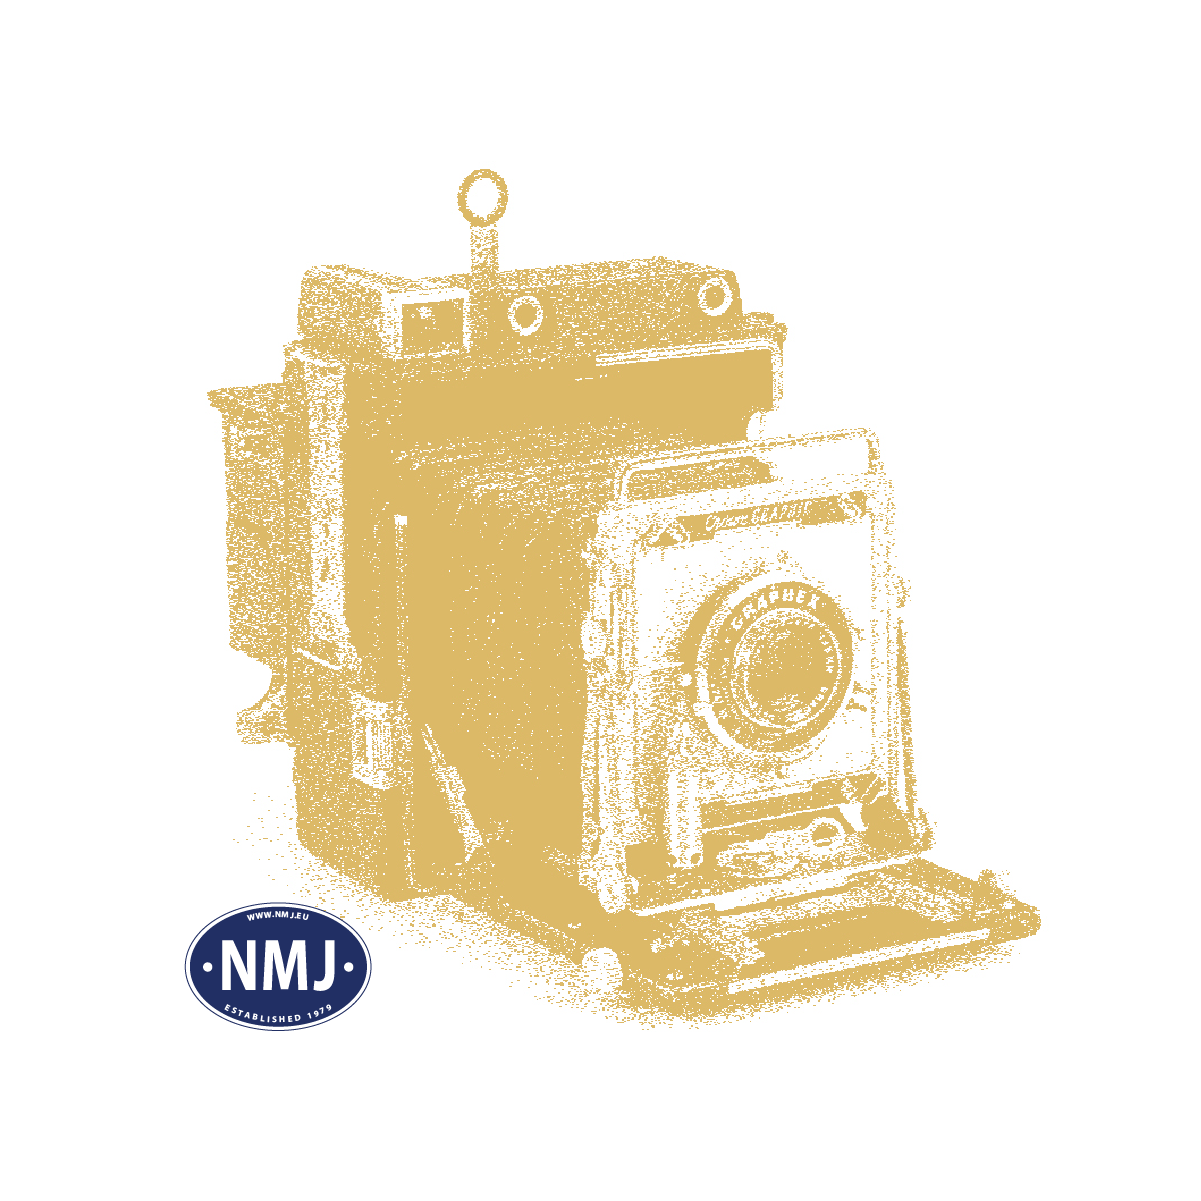 NMJT113.302 - NMJ Topline NSB CB1 21219, Neuen Design